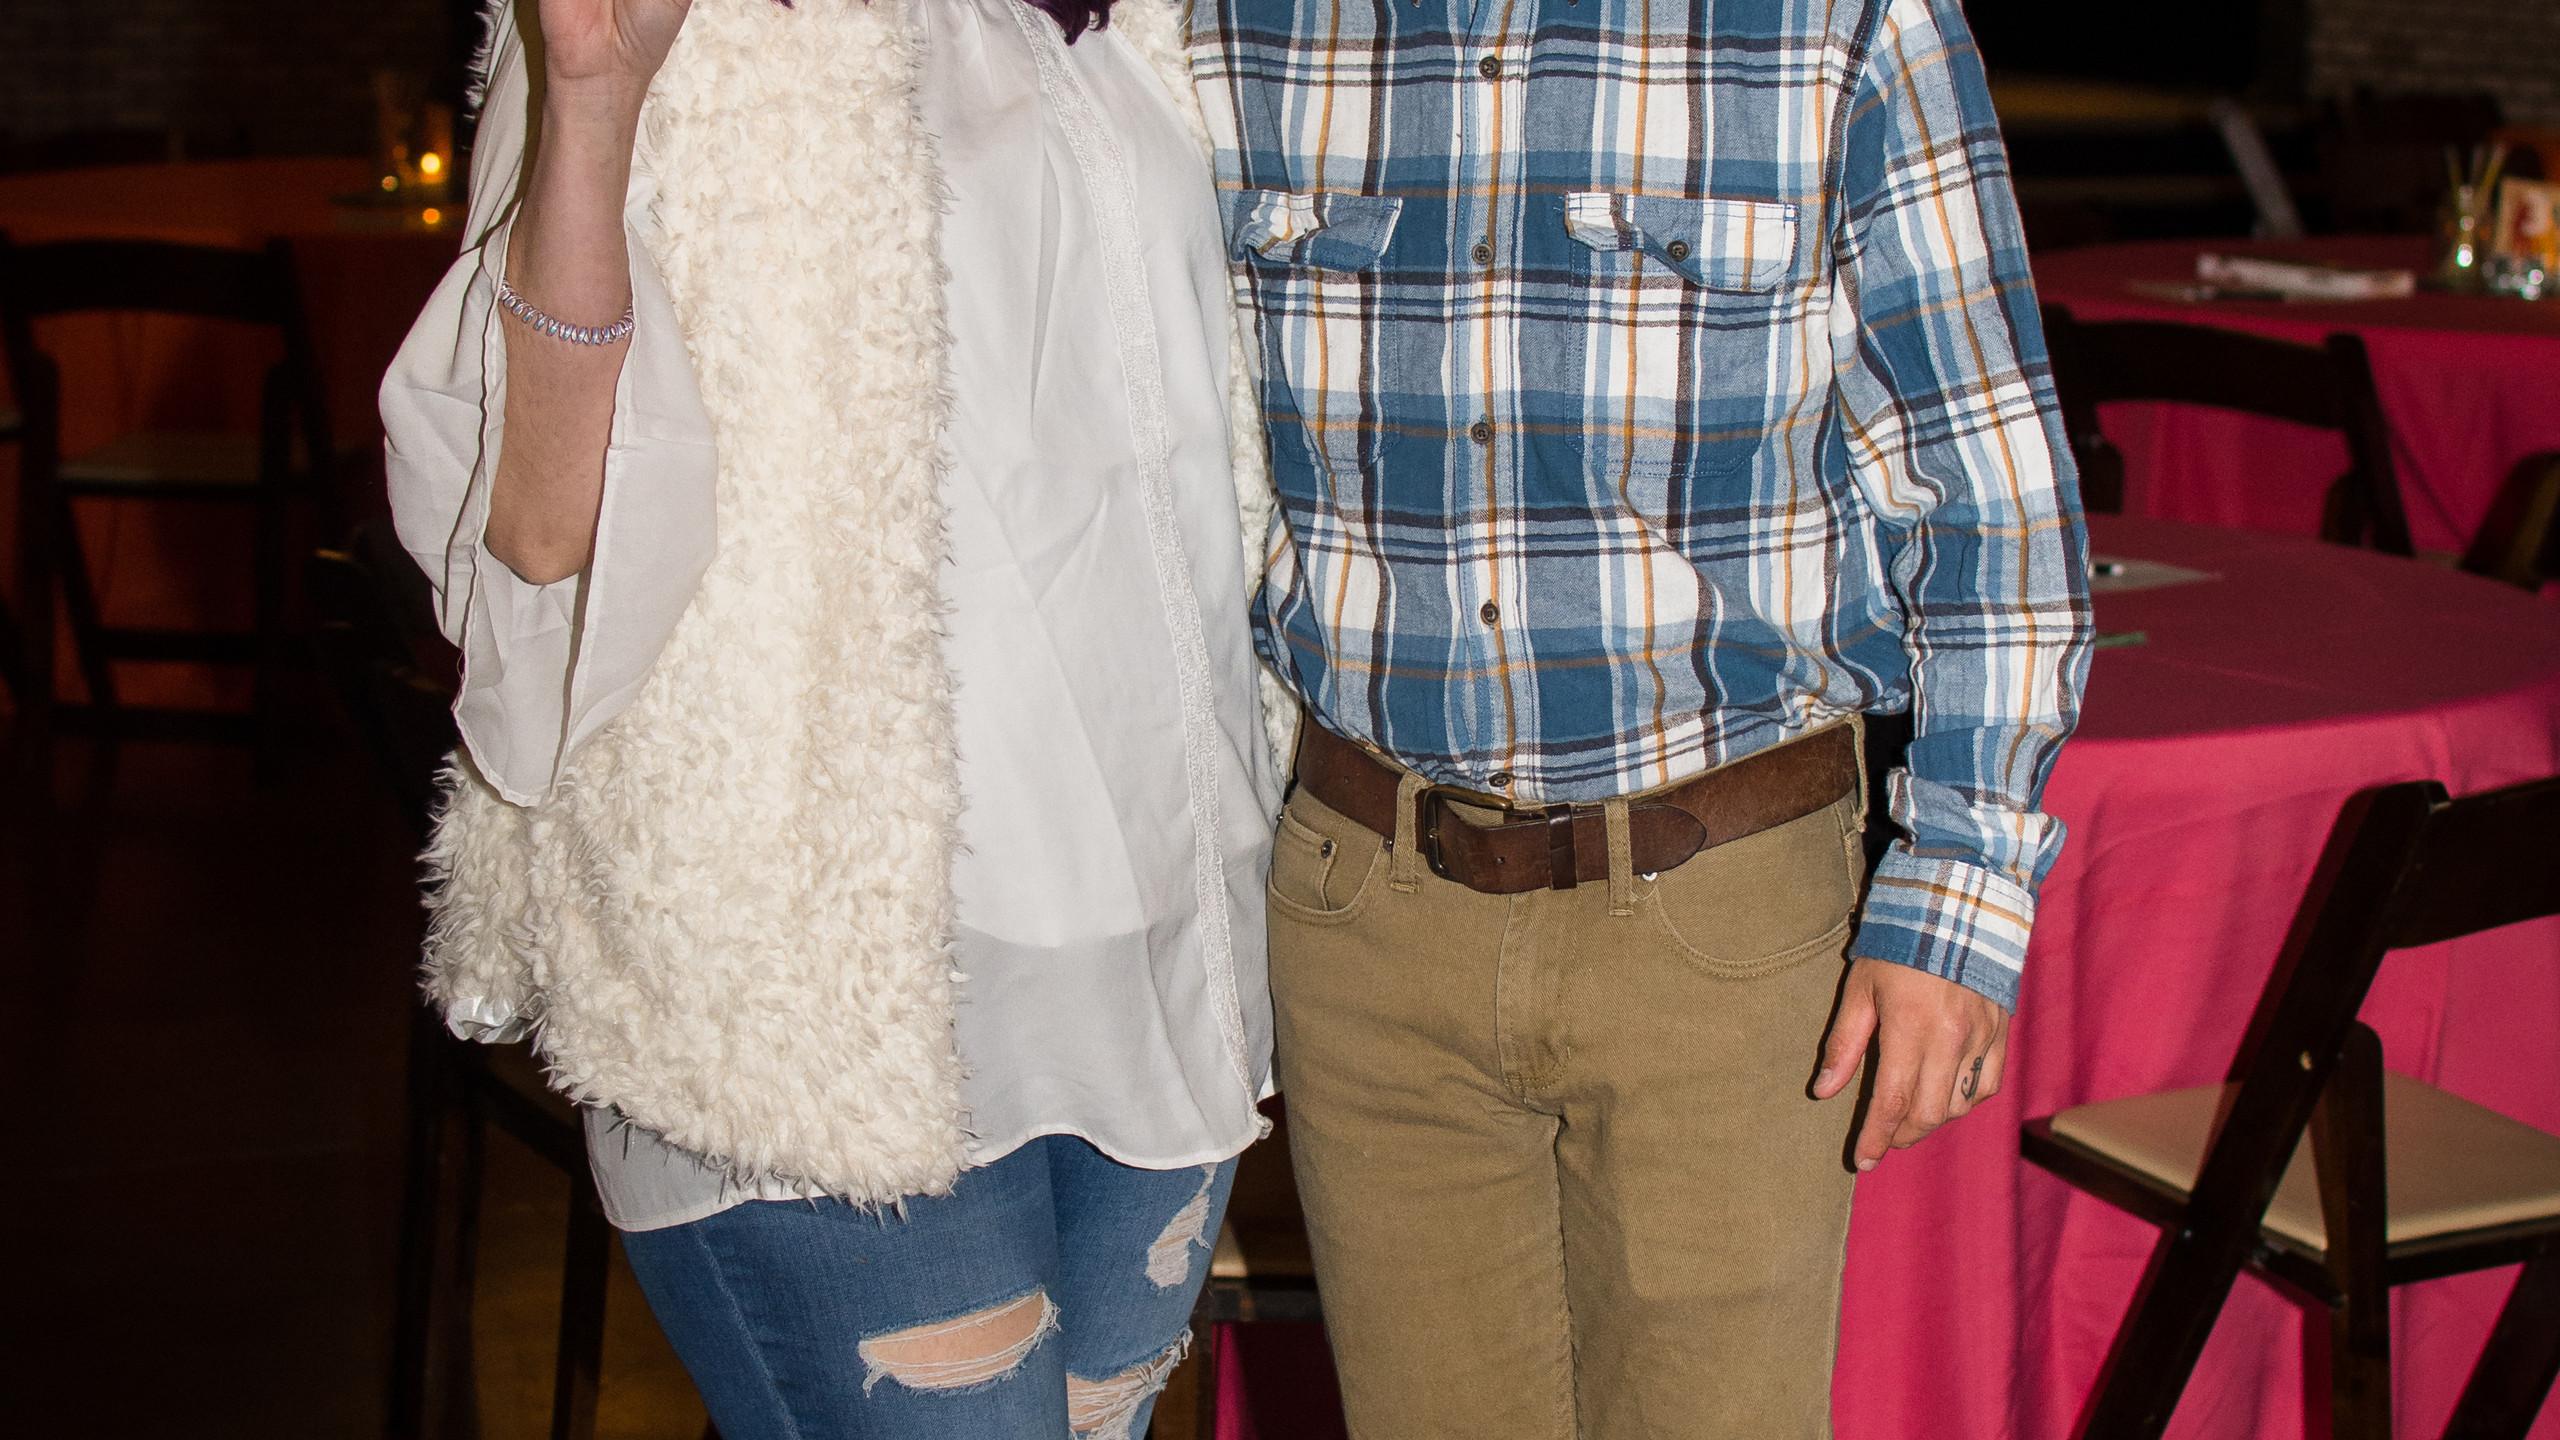 Abby and Jordan Wilkin